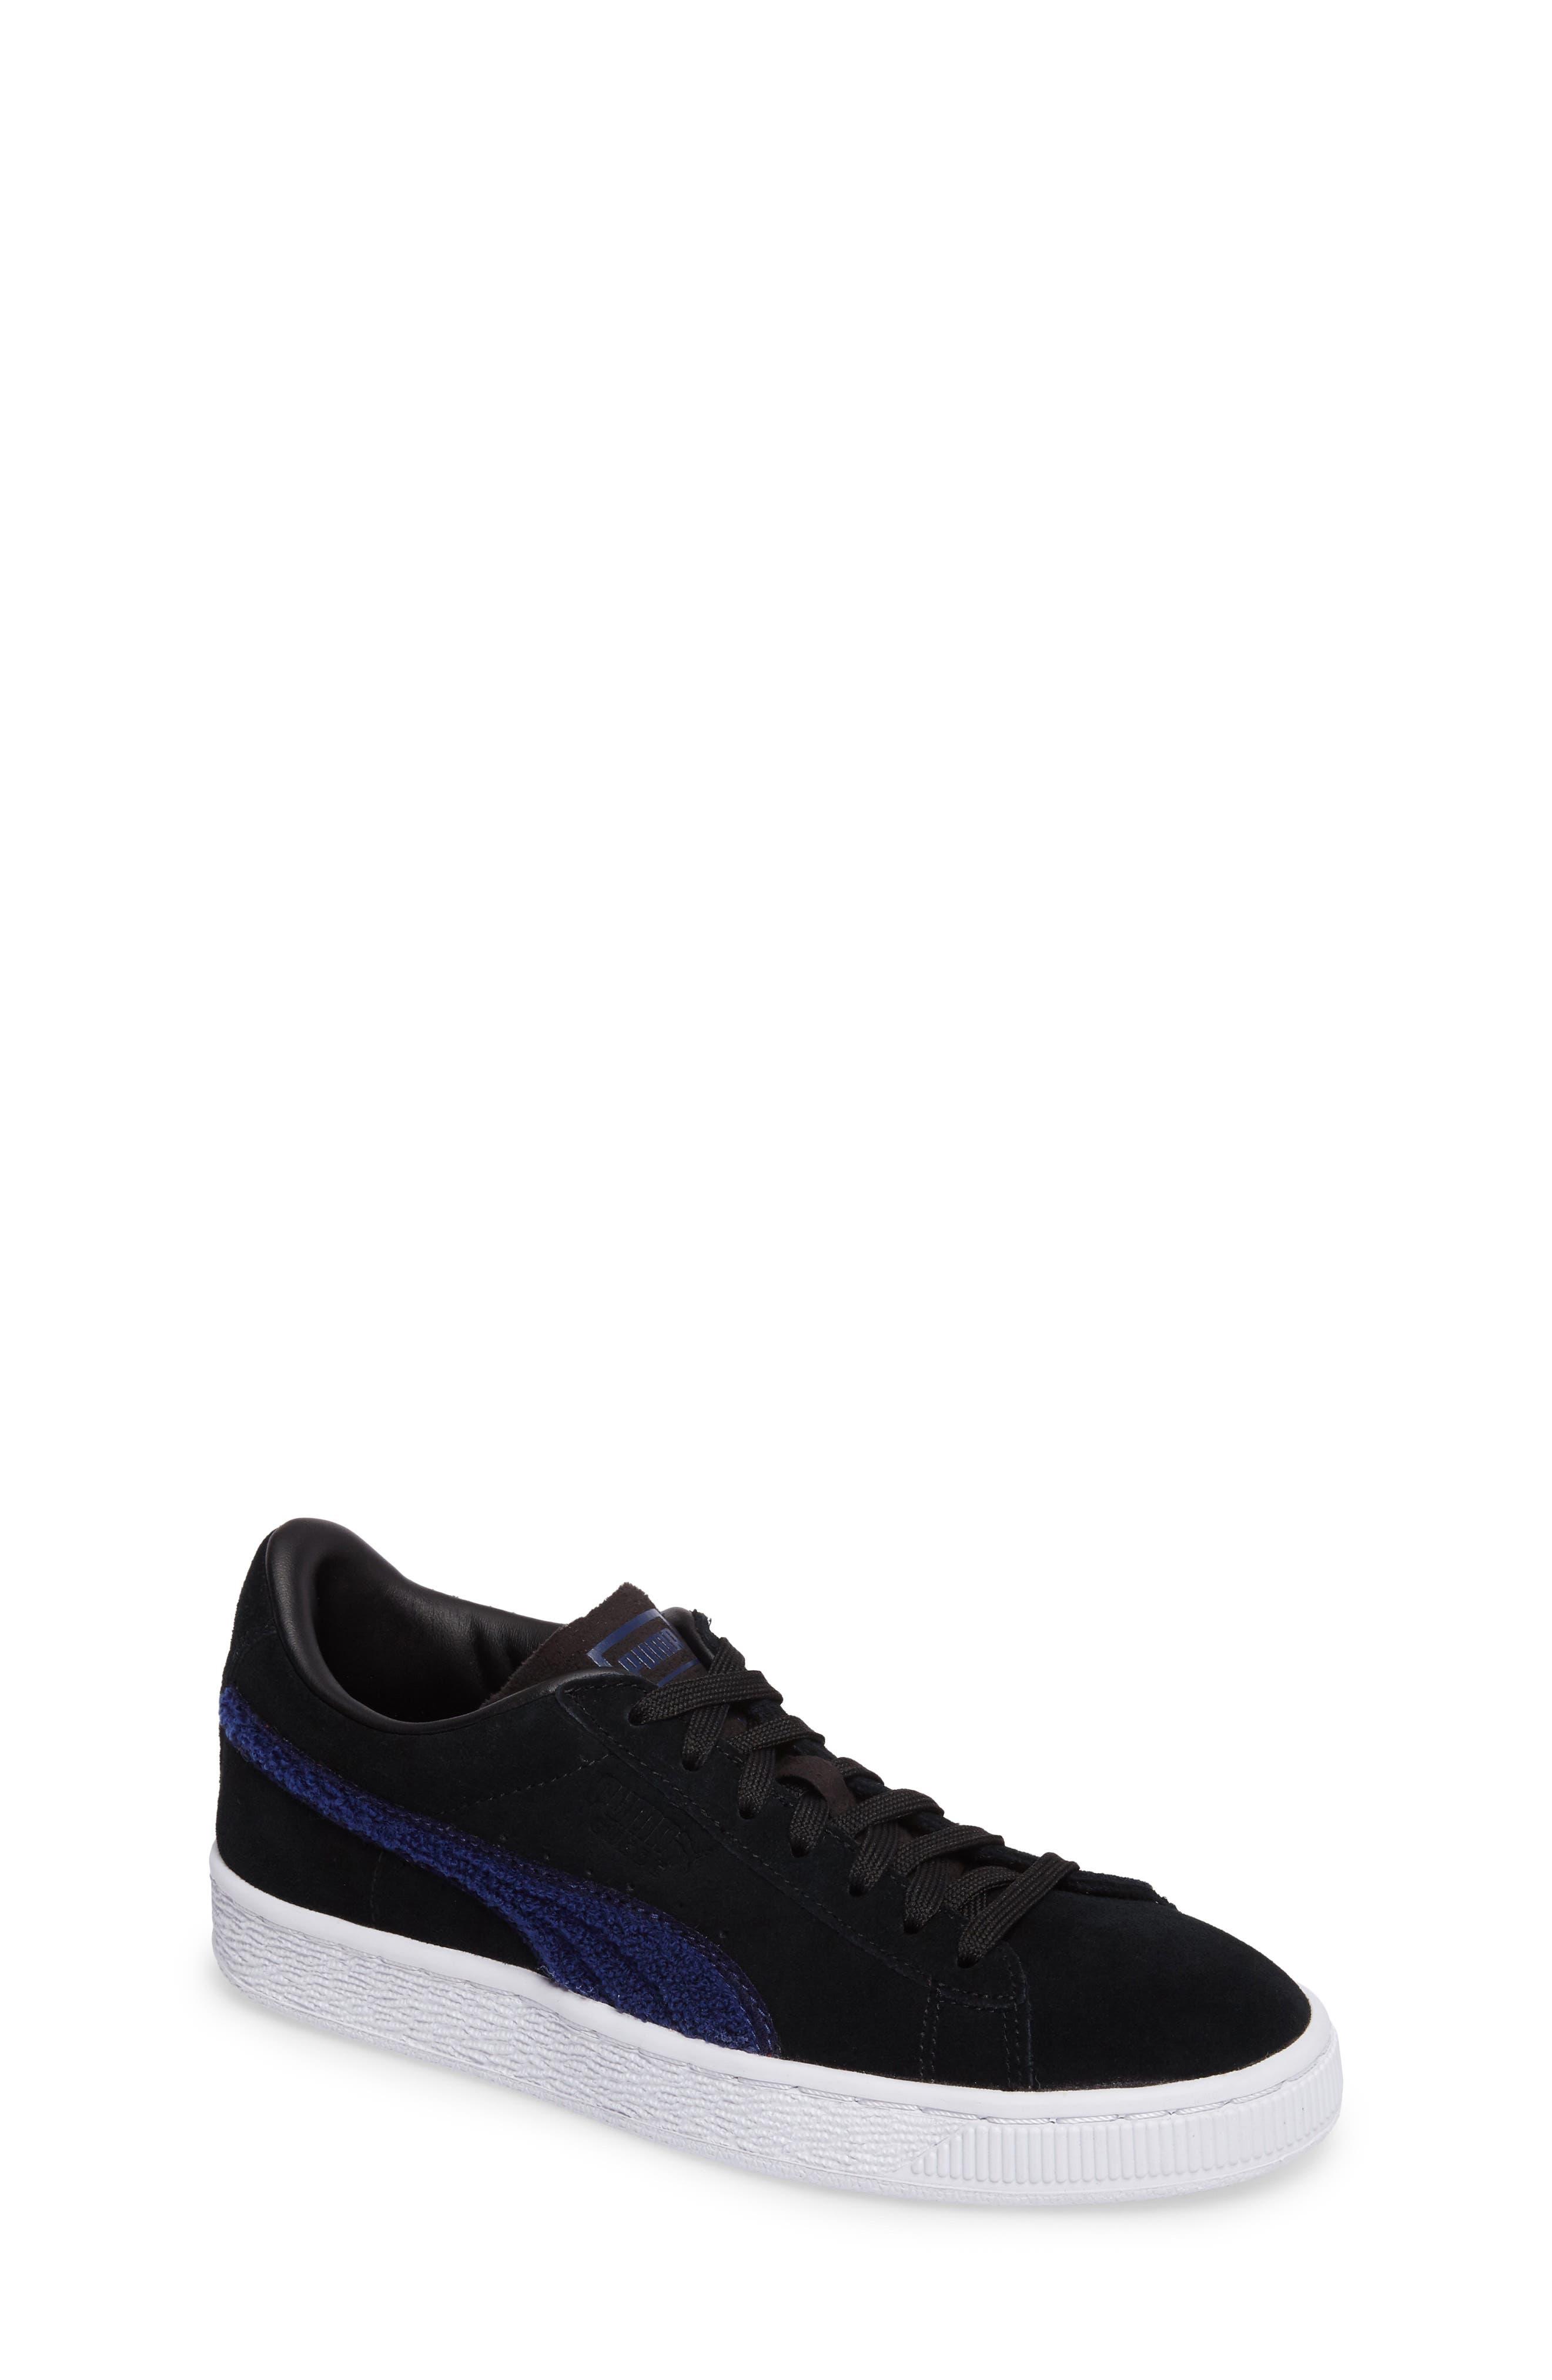 Classic Terry Jr Sneaker,                             Main thumbnail 1, color,                             001